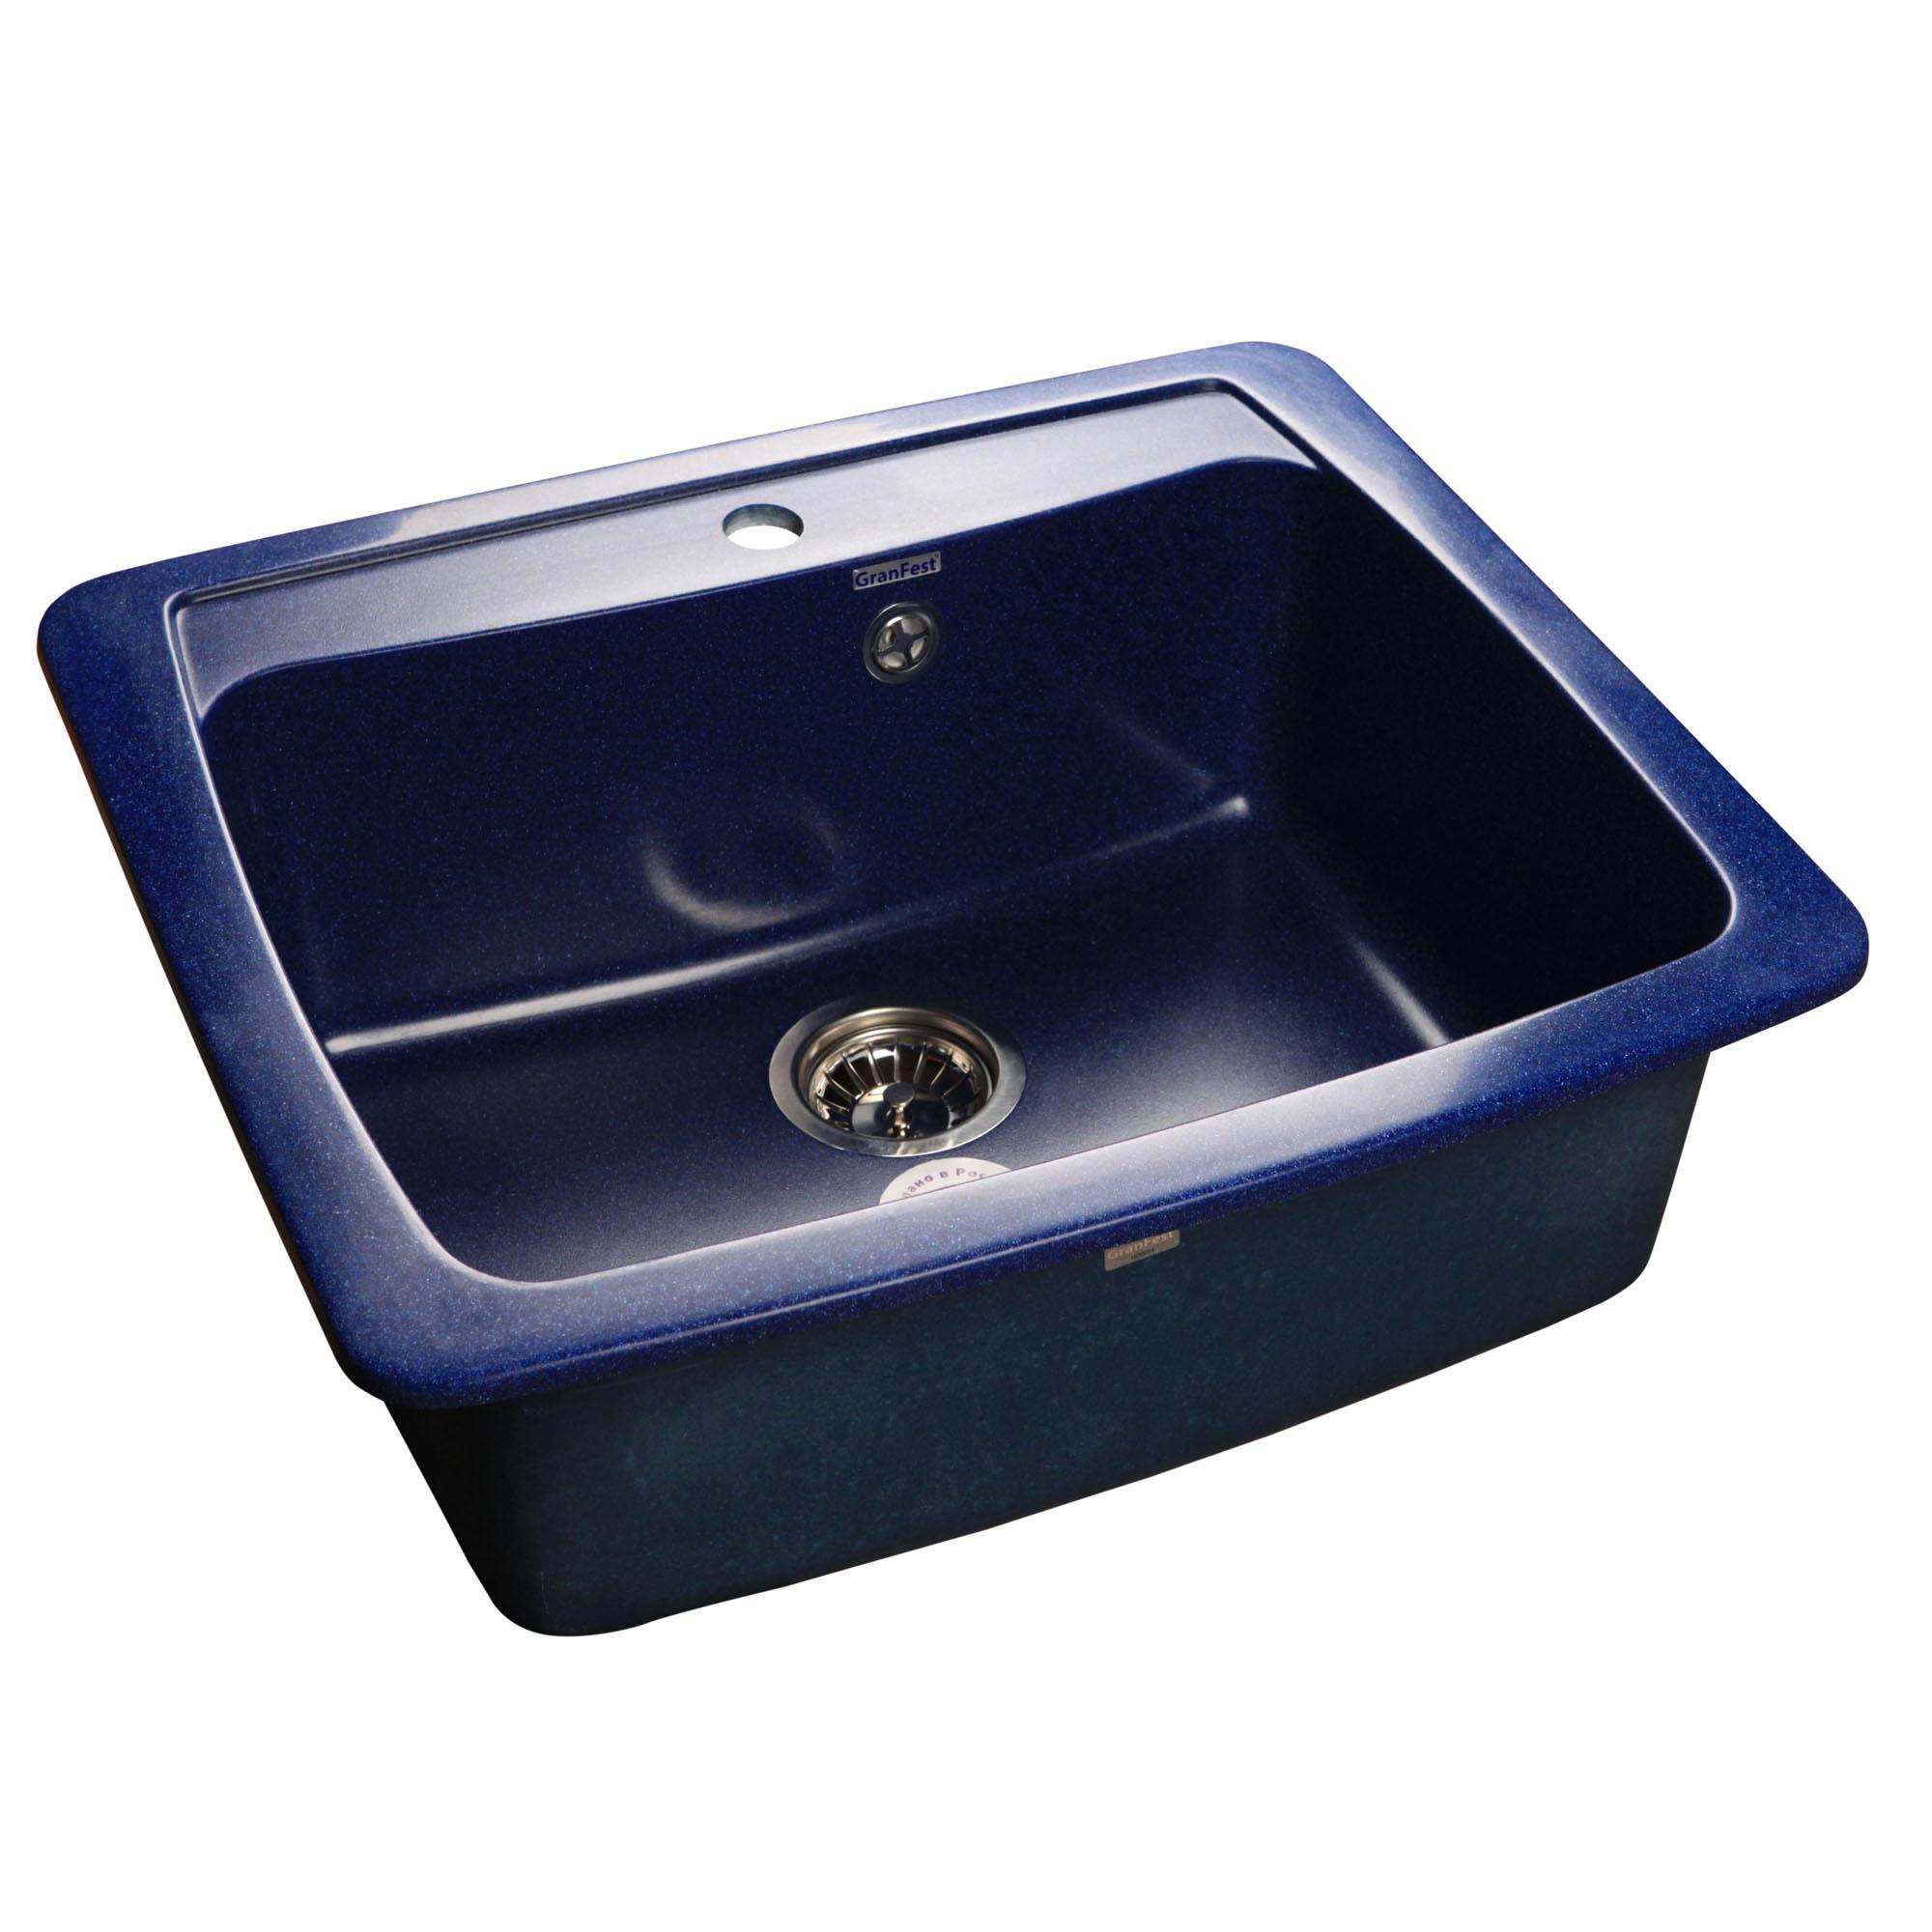 Кухонная мойка GranFest Standart GF-S605 синий мойка кухонная granfest гранит 605x510 gf s605 бежевая